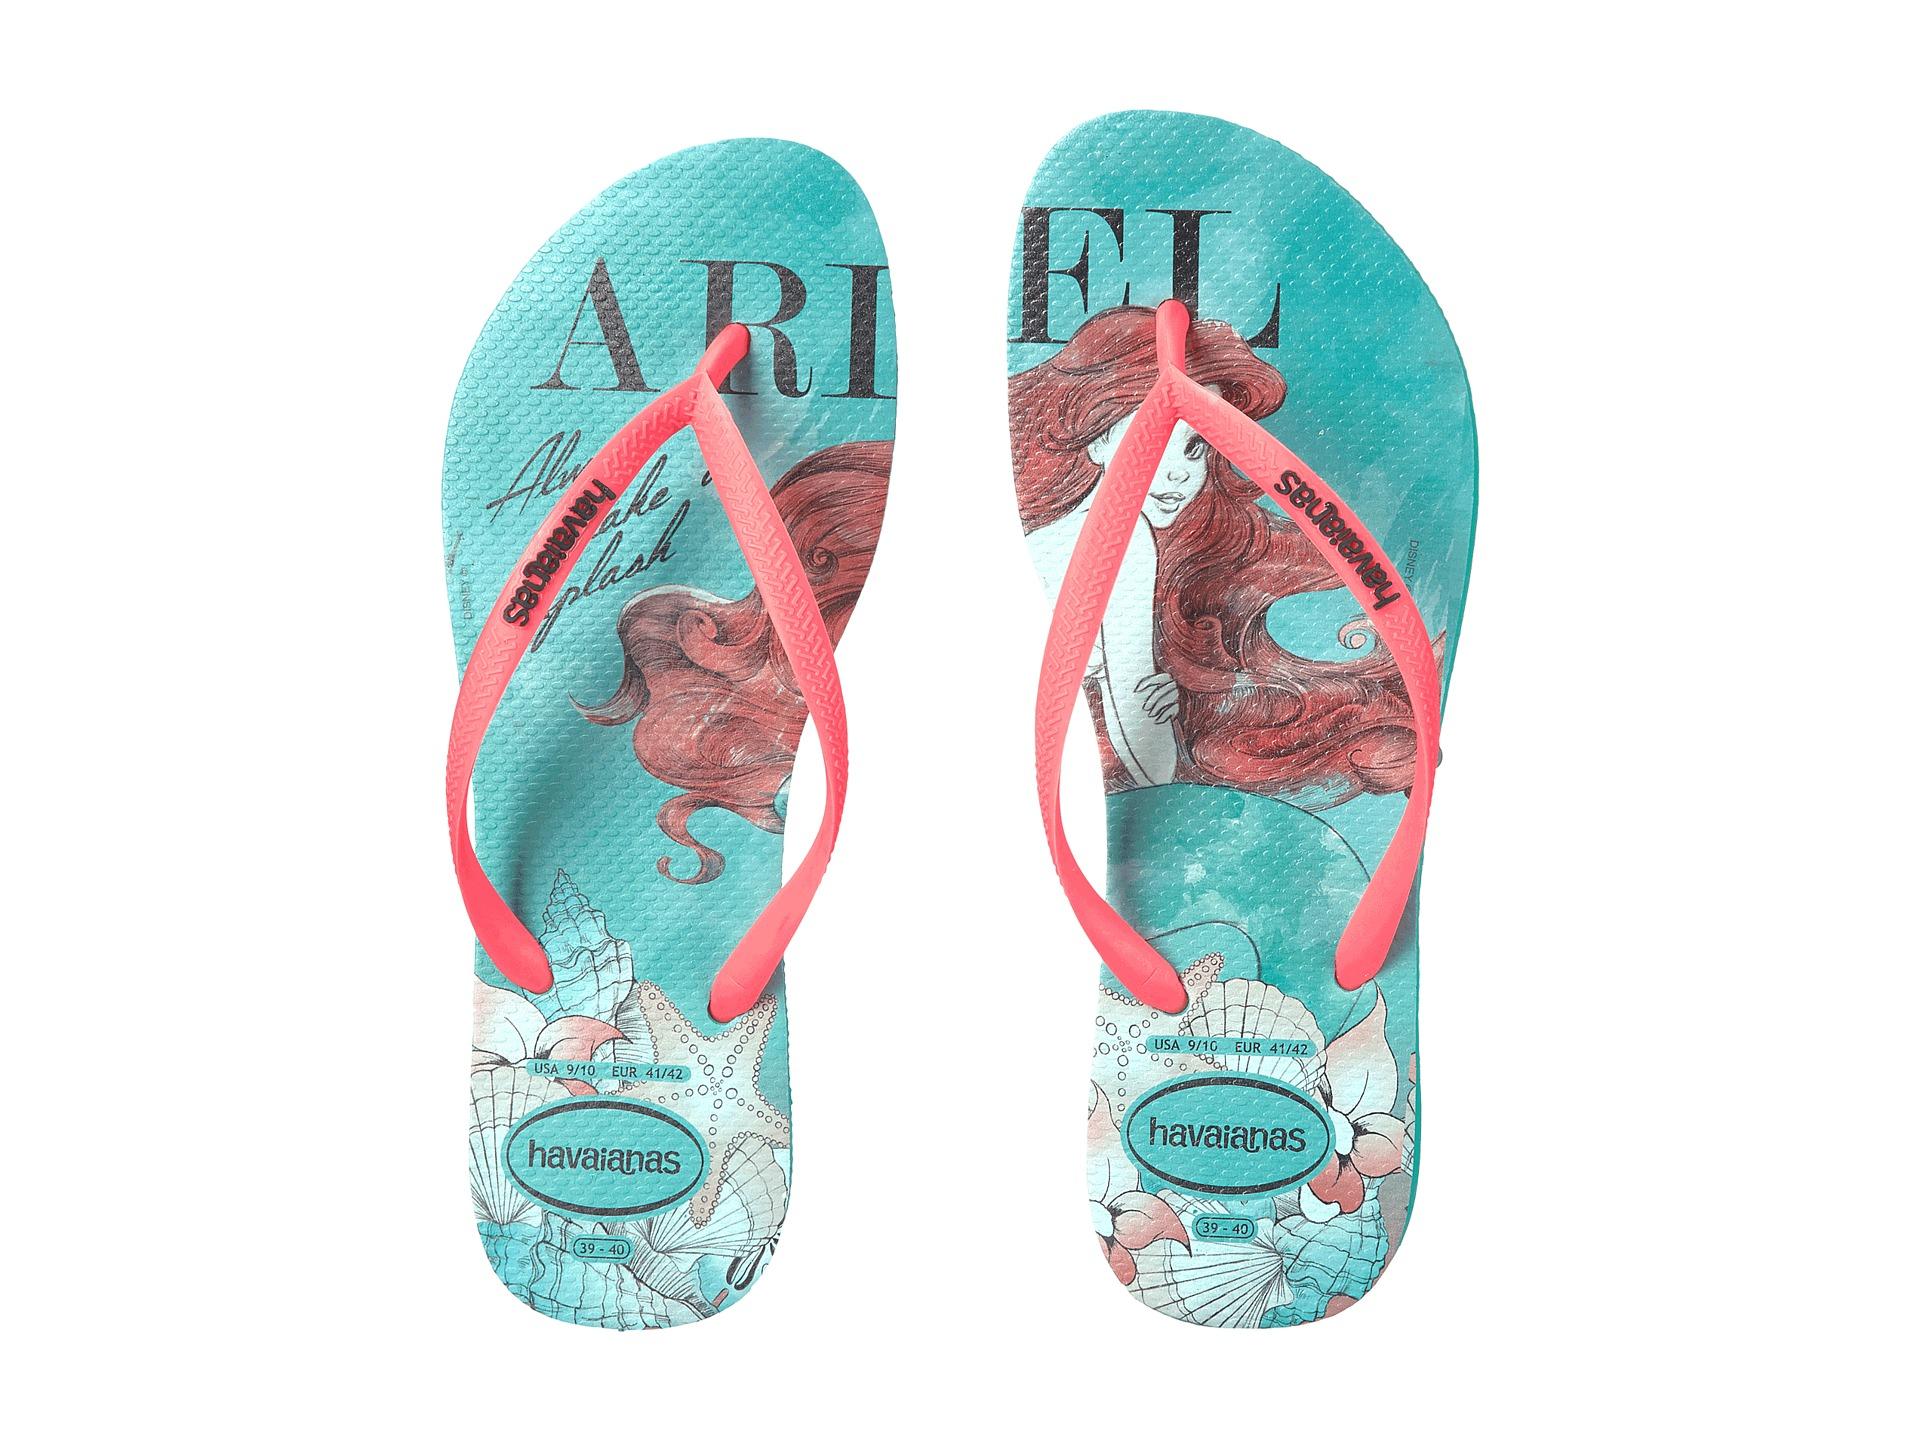 gratis ungdoms orgie flip-flops